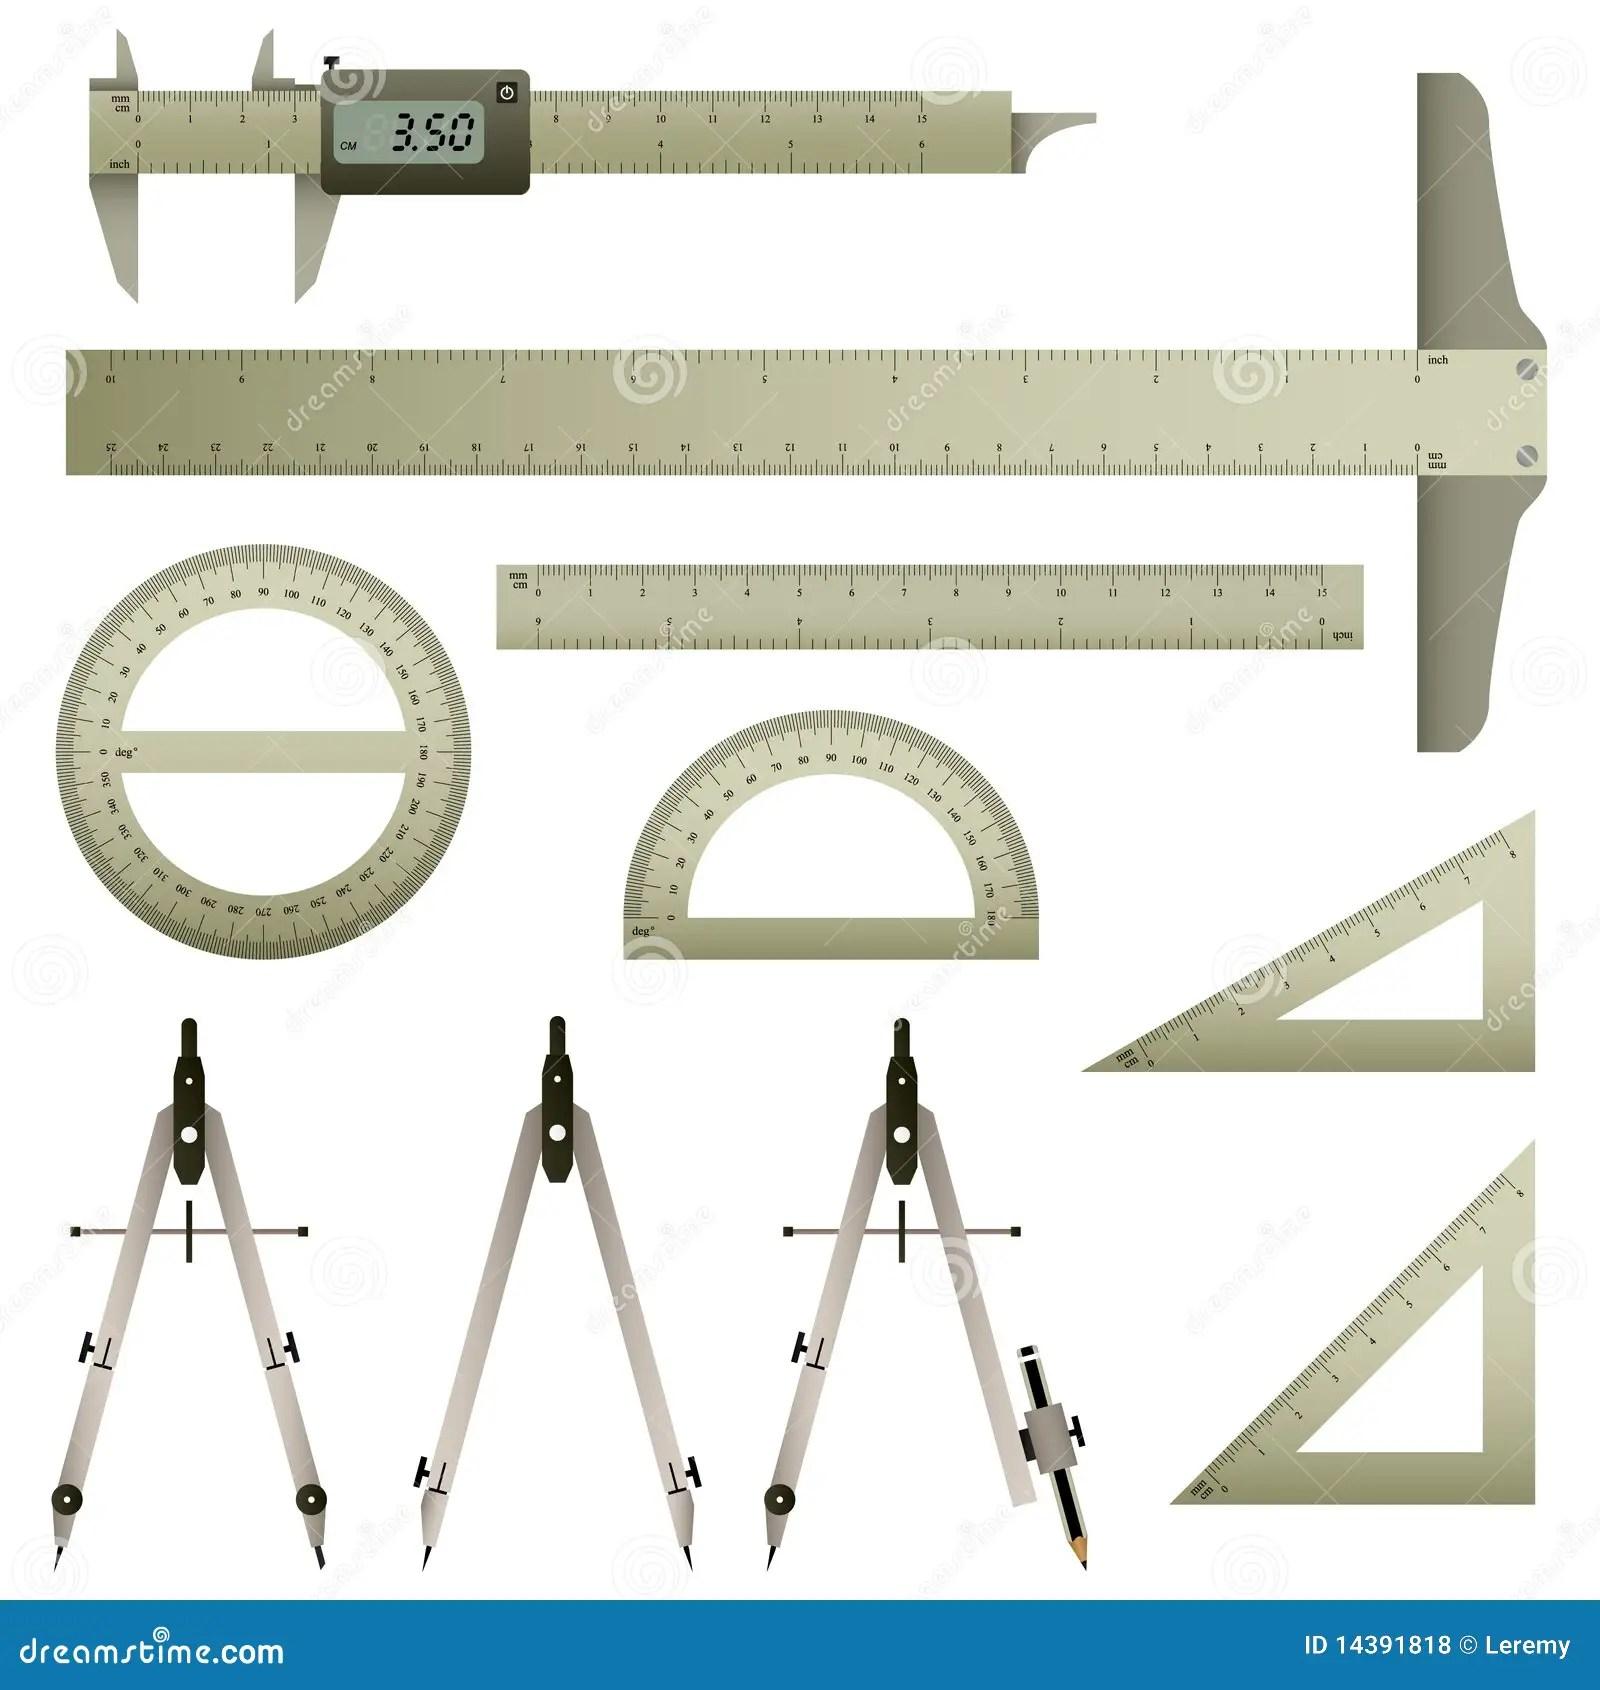 Mathematics Measurement Instrument Royalty Free Stock